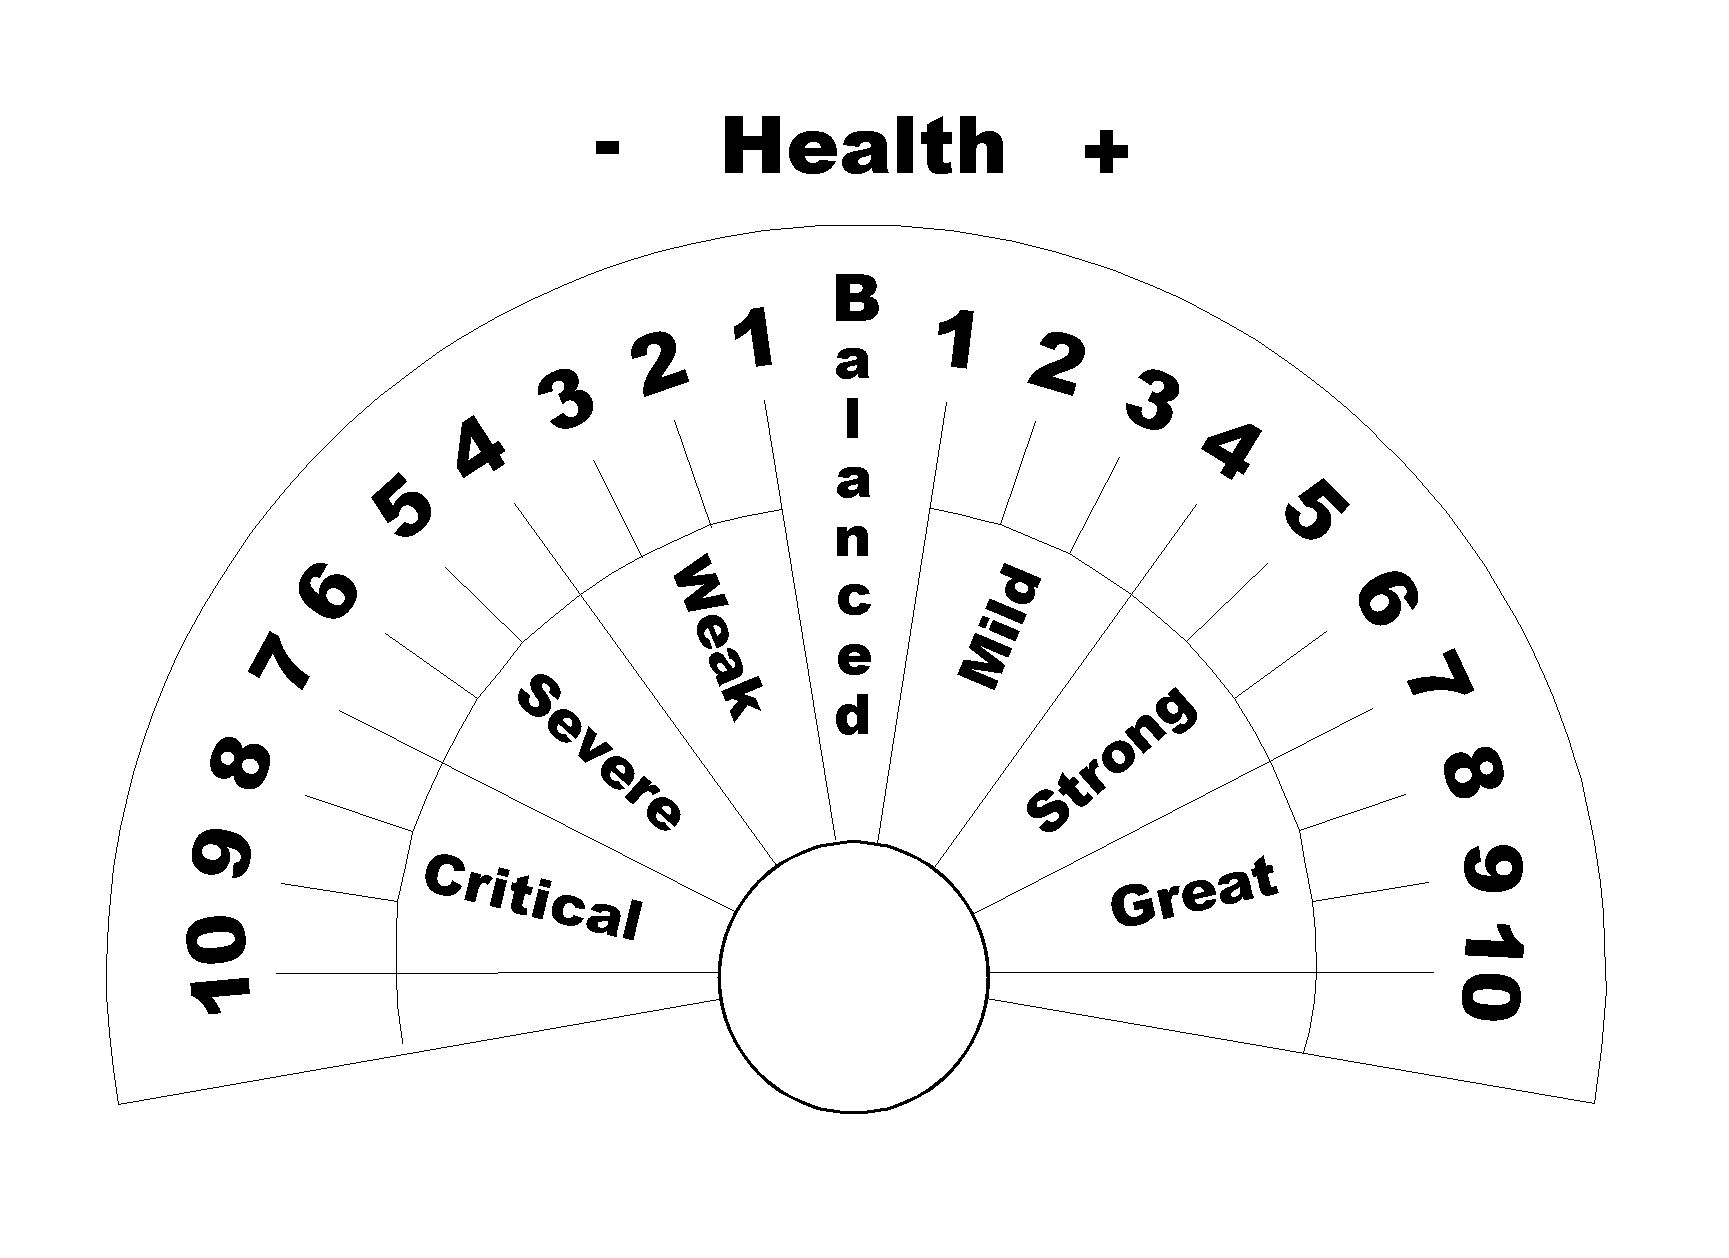 medium resolution of here are the dowsing charts palmistry pendulum board meditation health chart